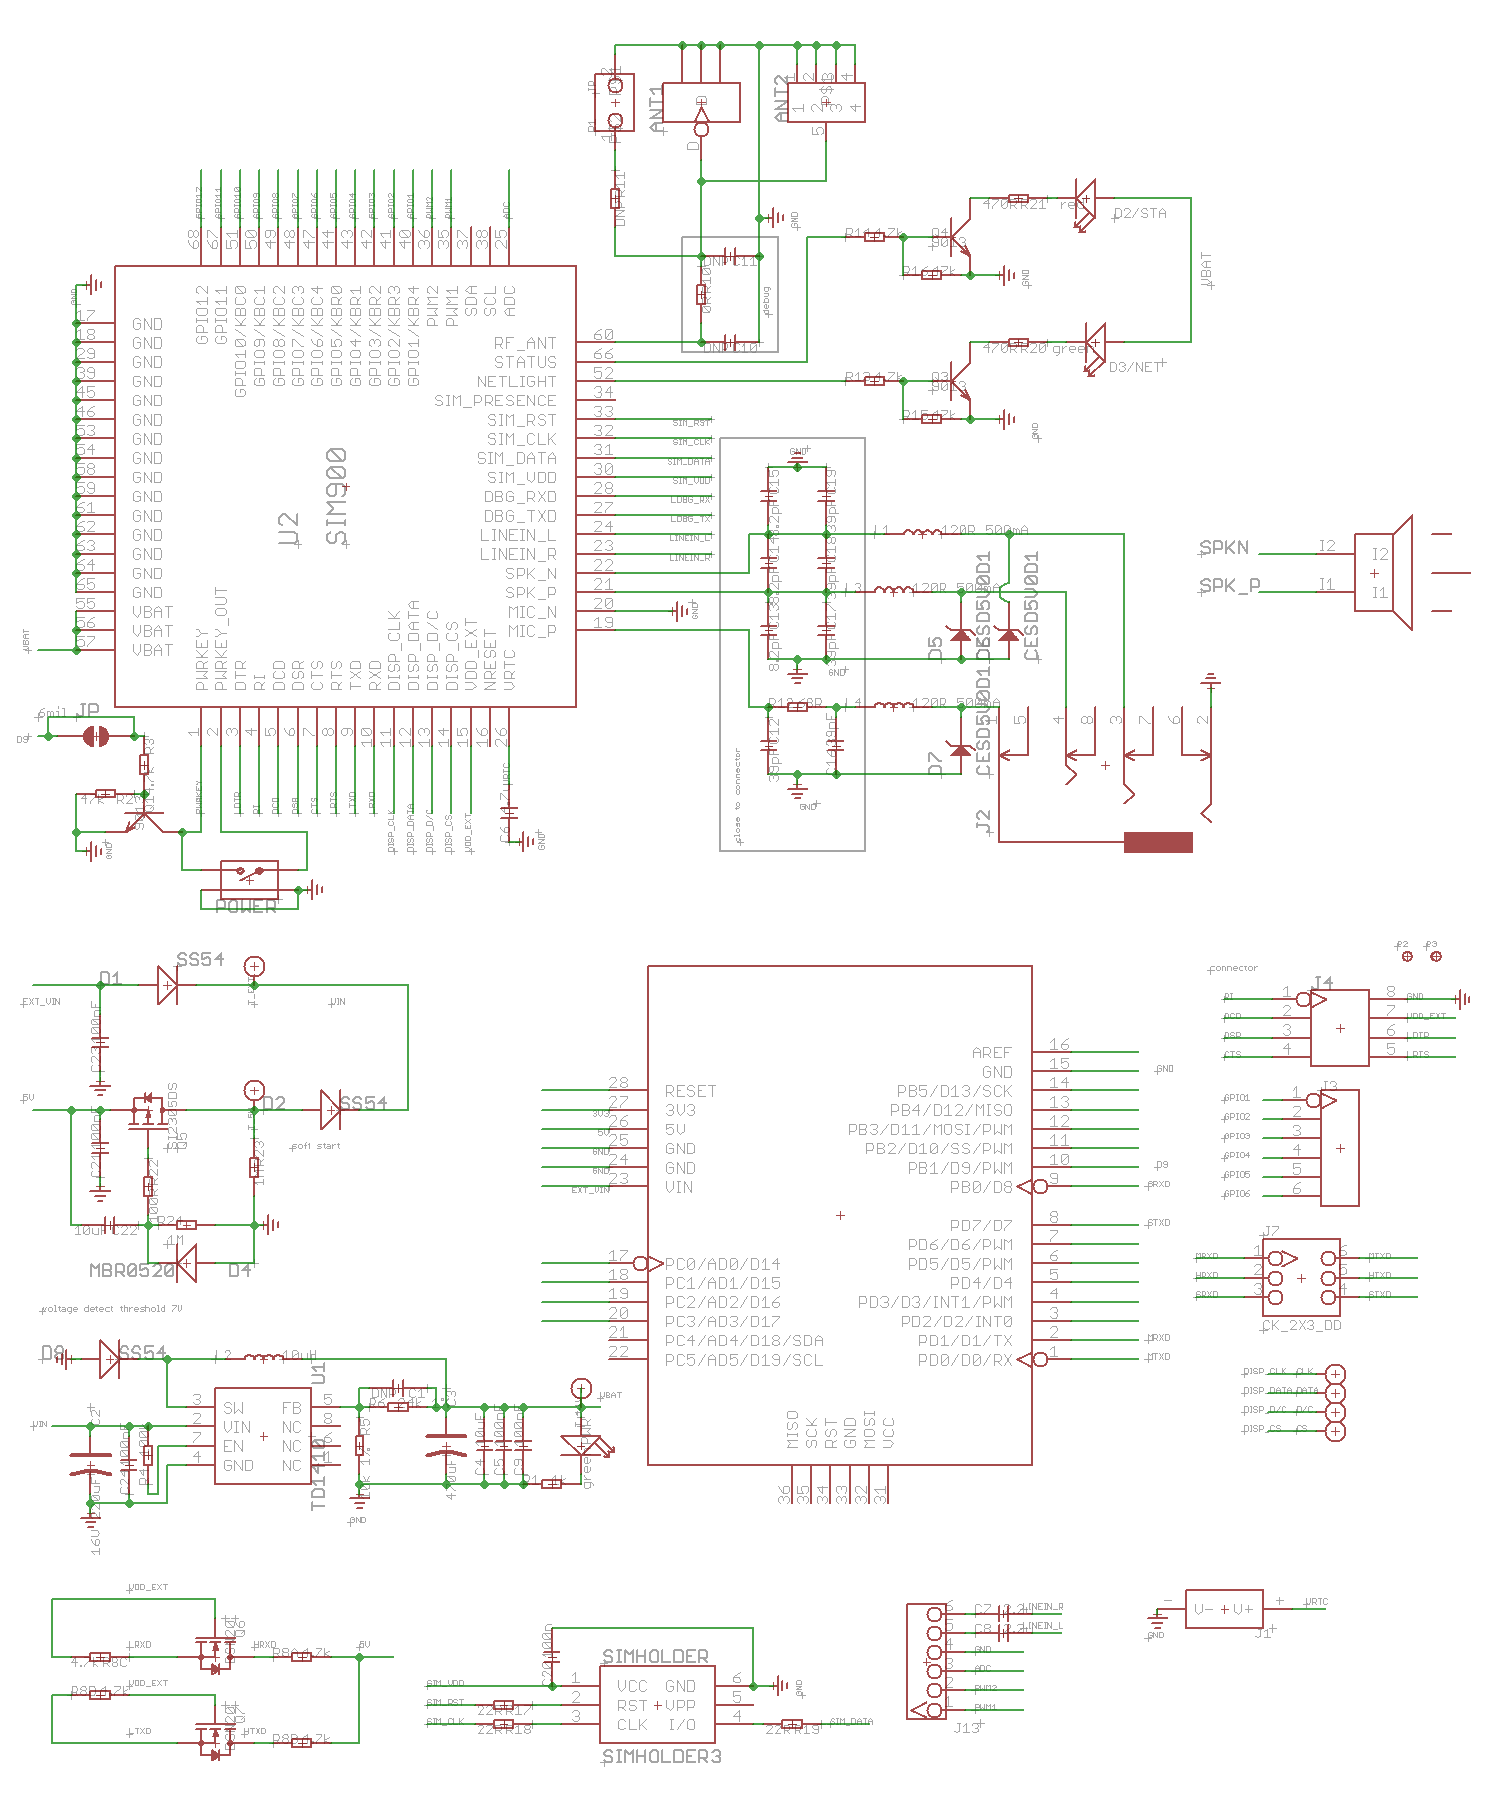 SIM900 diagrama